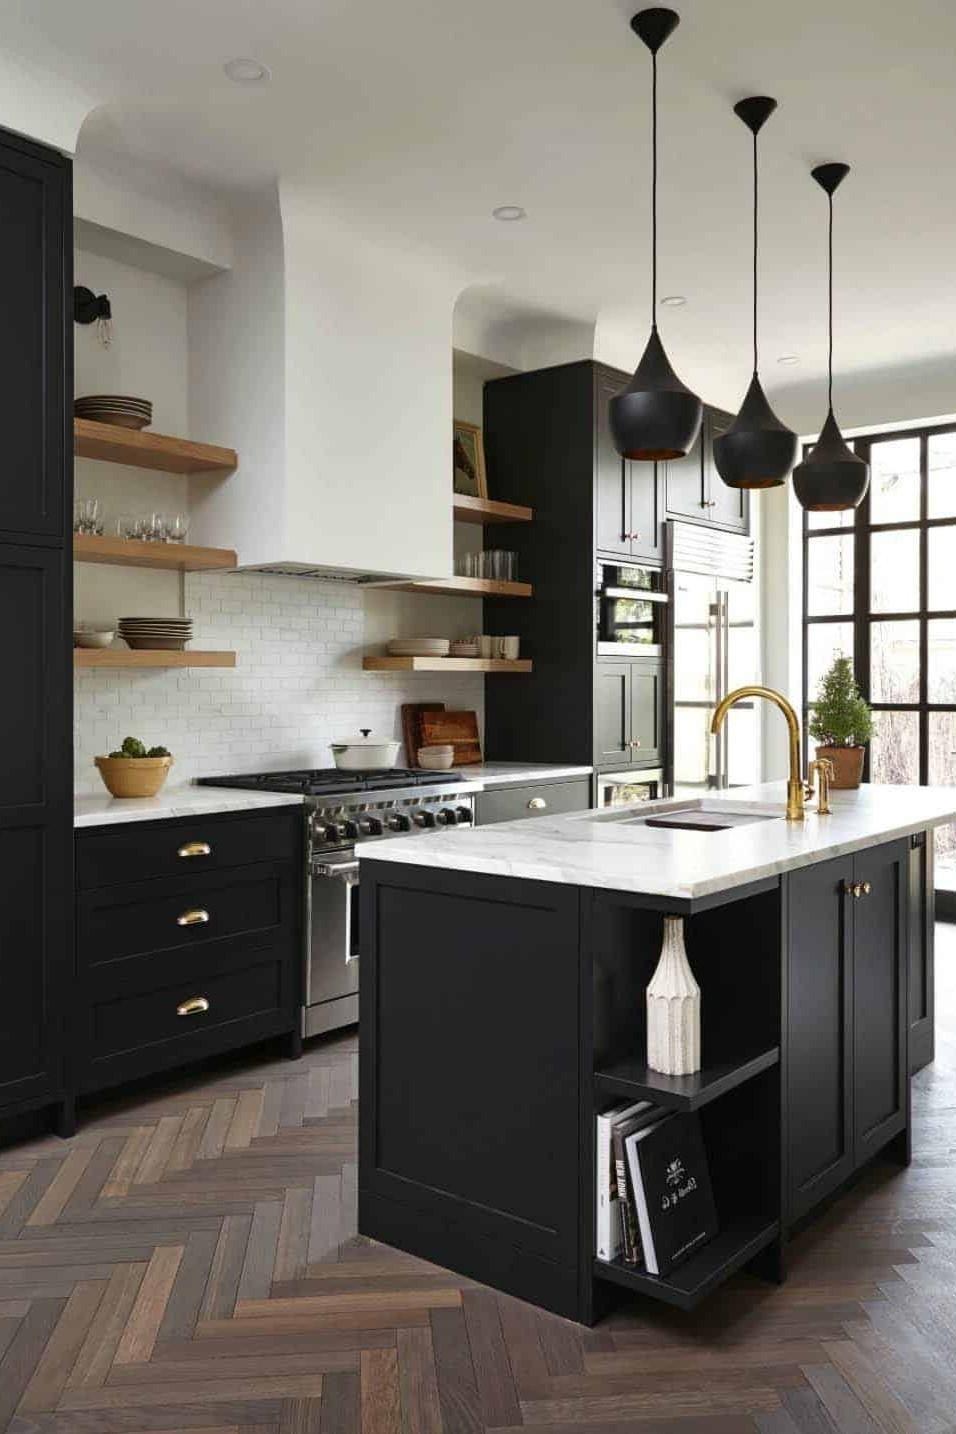 46+ Stylish Rustic Farmhouse Kitchen Ideas